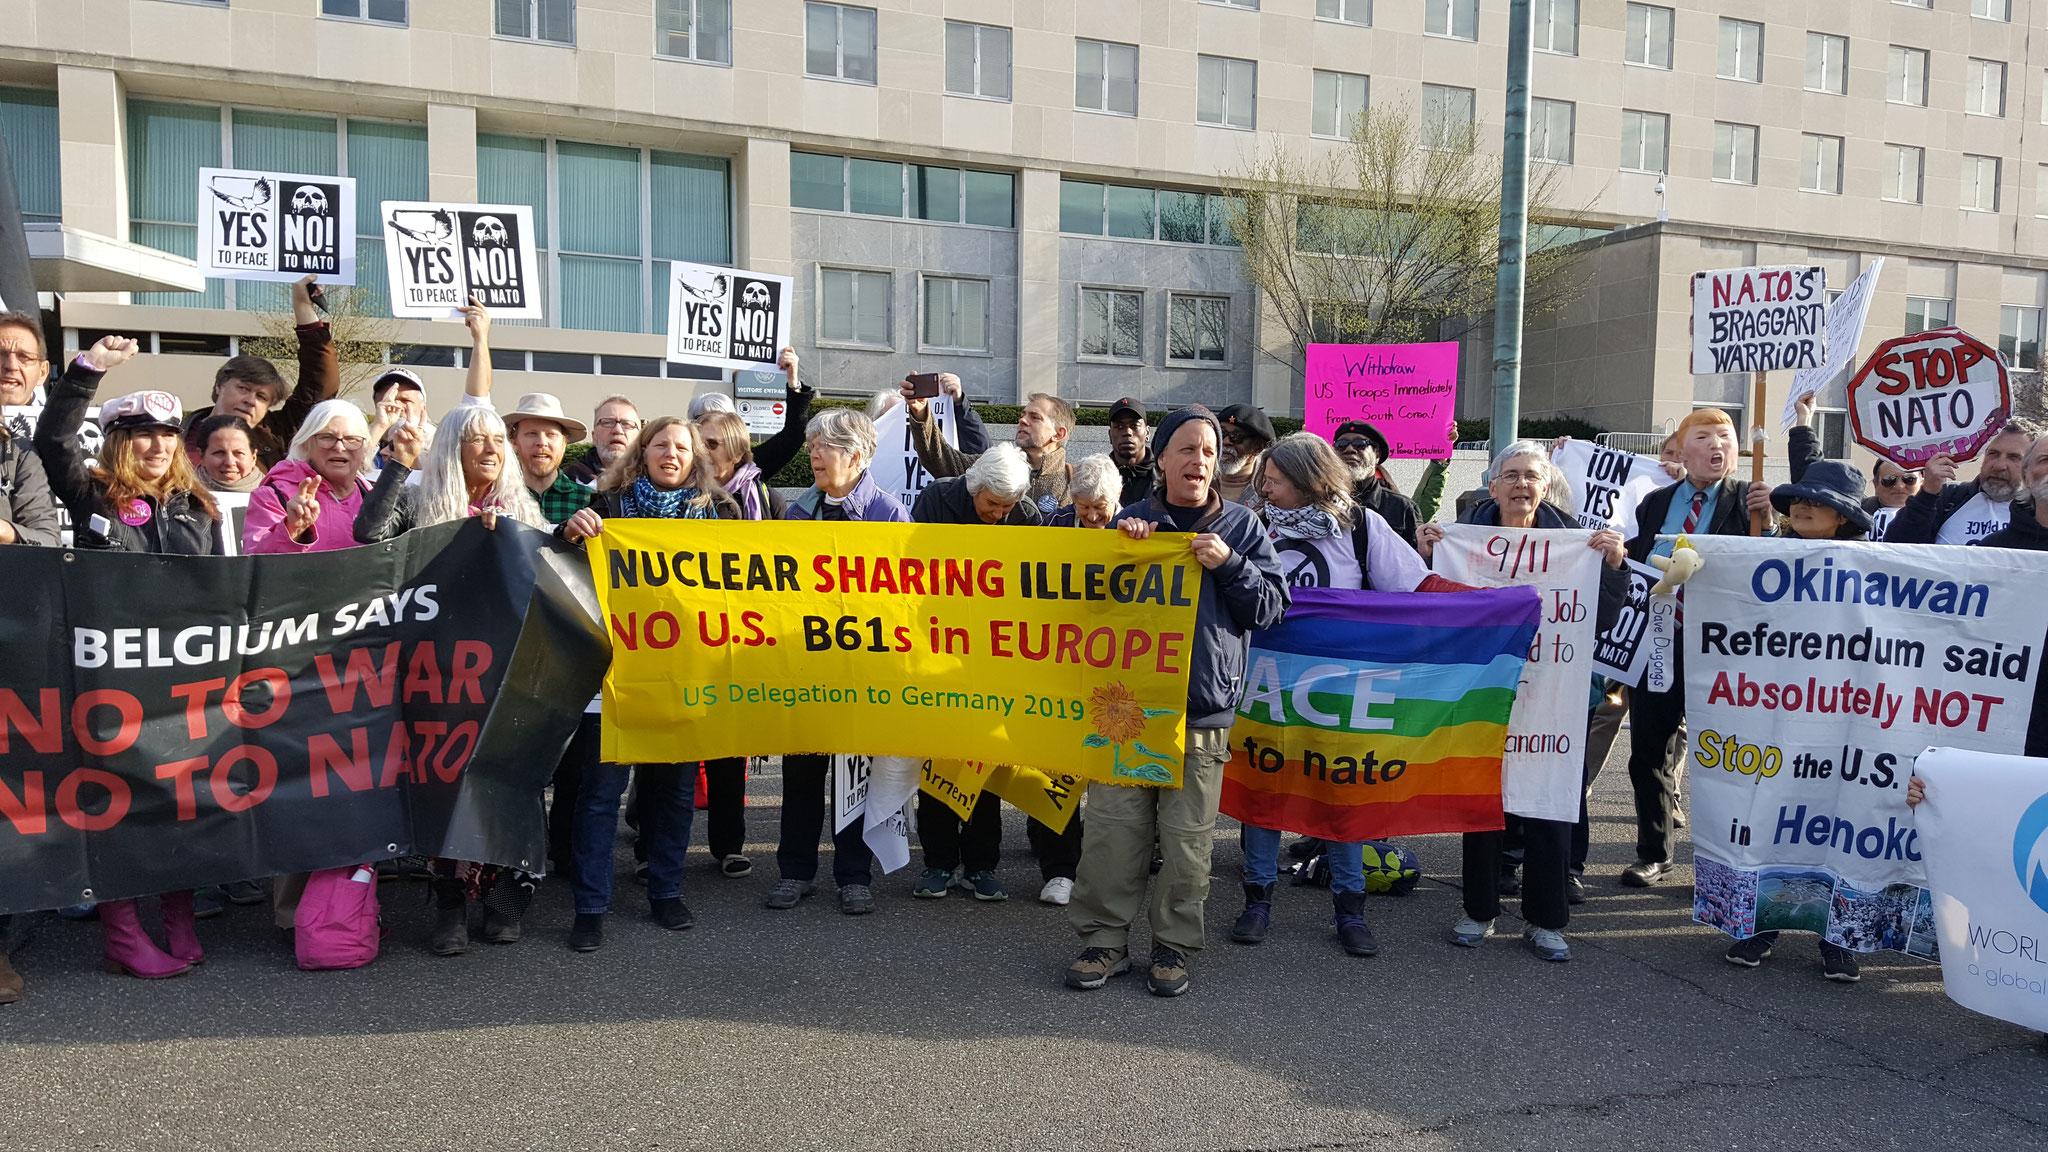 Demo in Washington